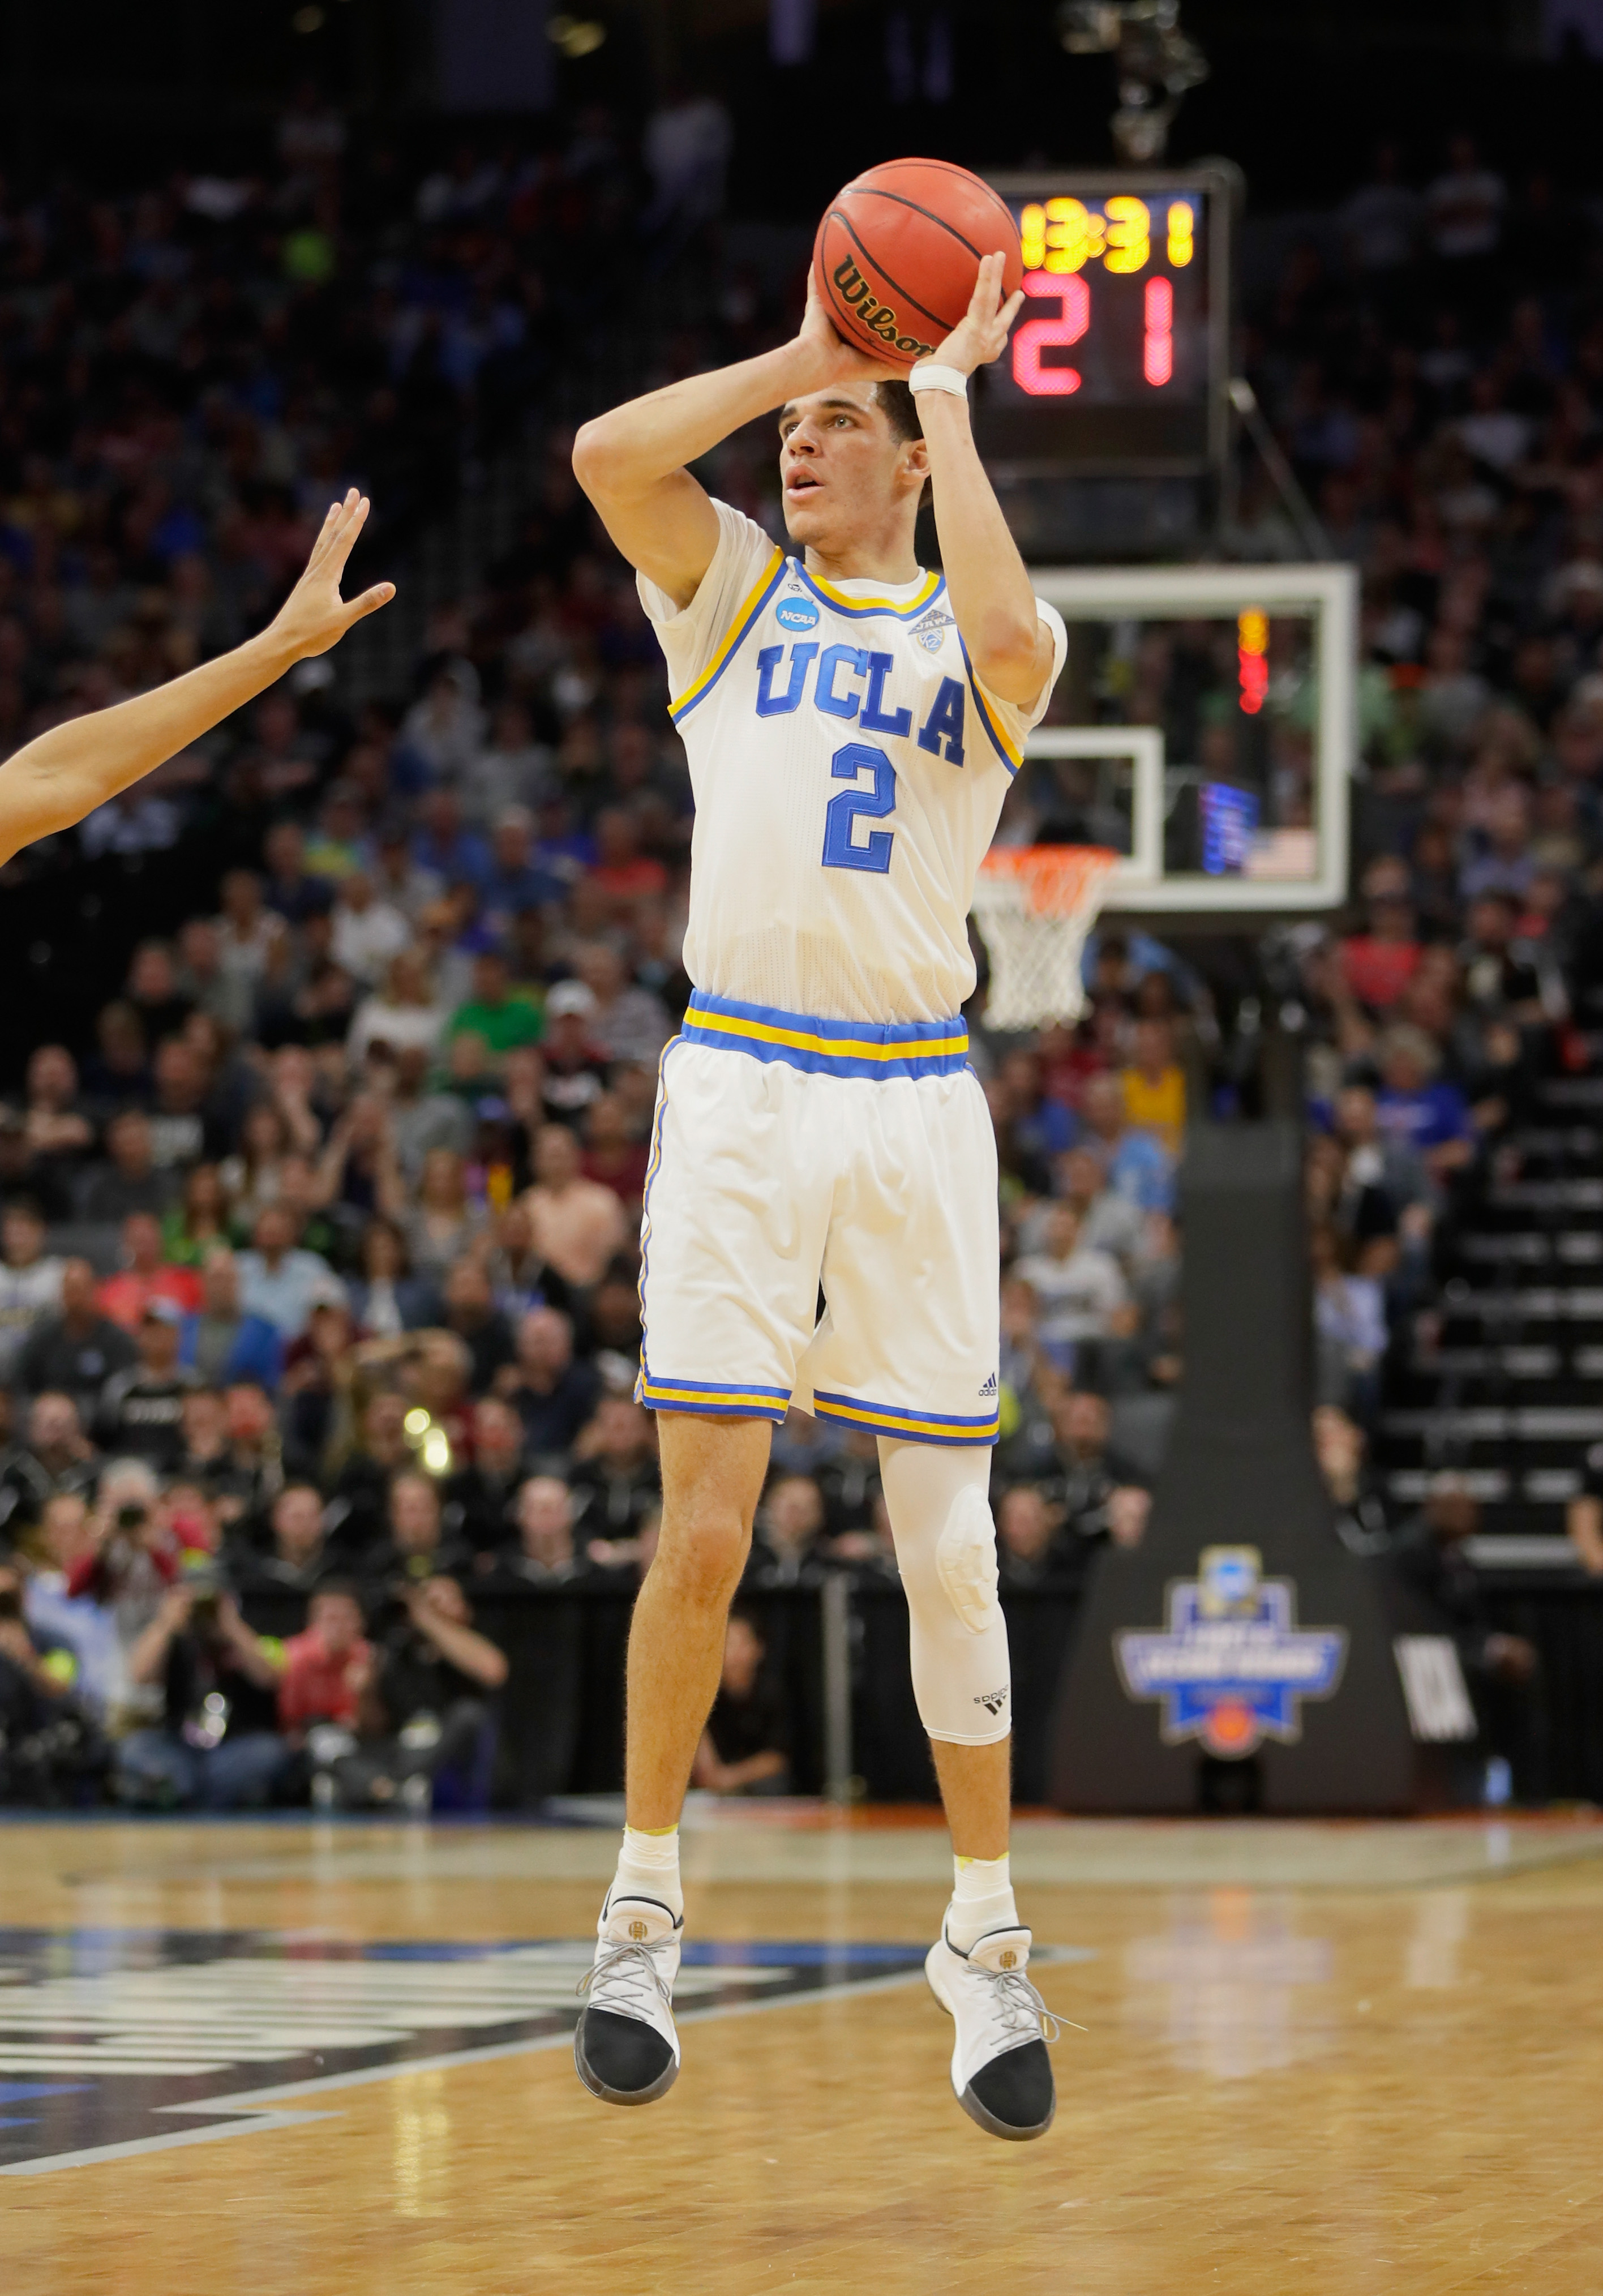 NCAA Basketball Tournament - Cincinnati v UCLA